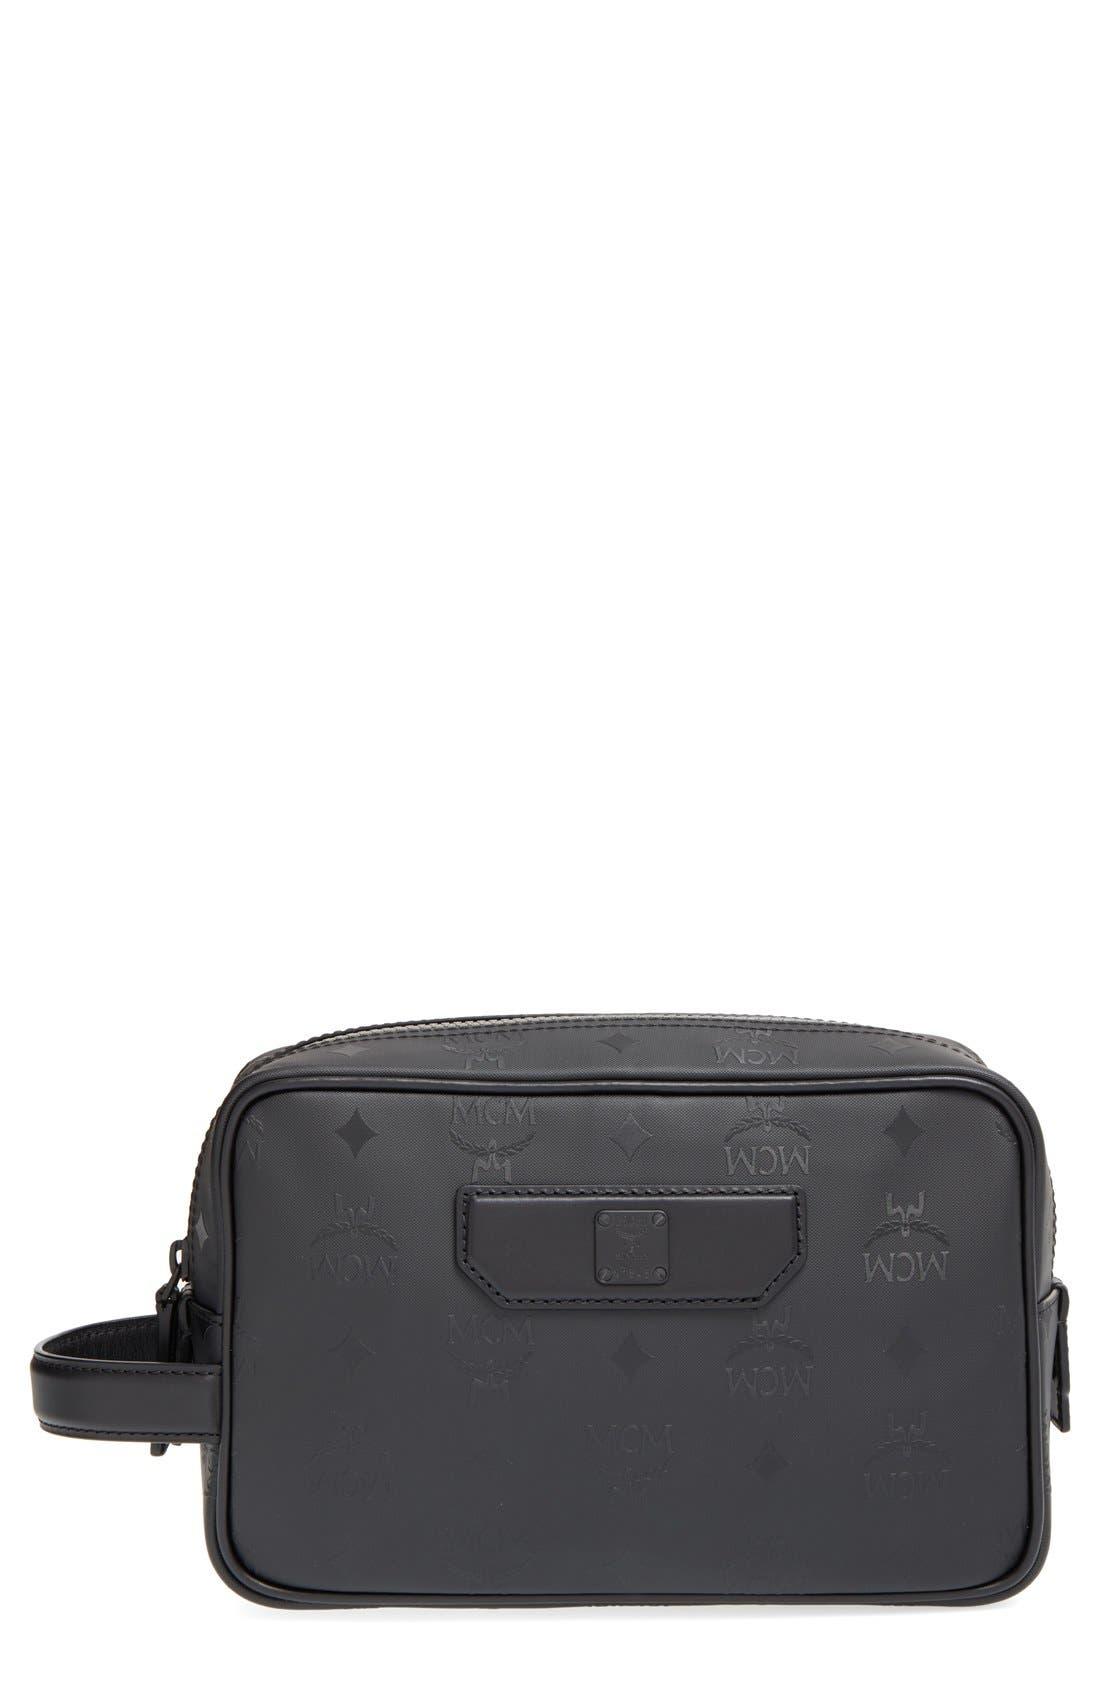 'Nomad' Travel Case,                         Main,                         color, Black